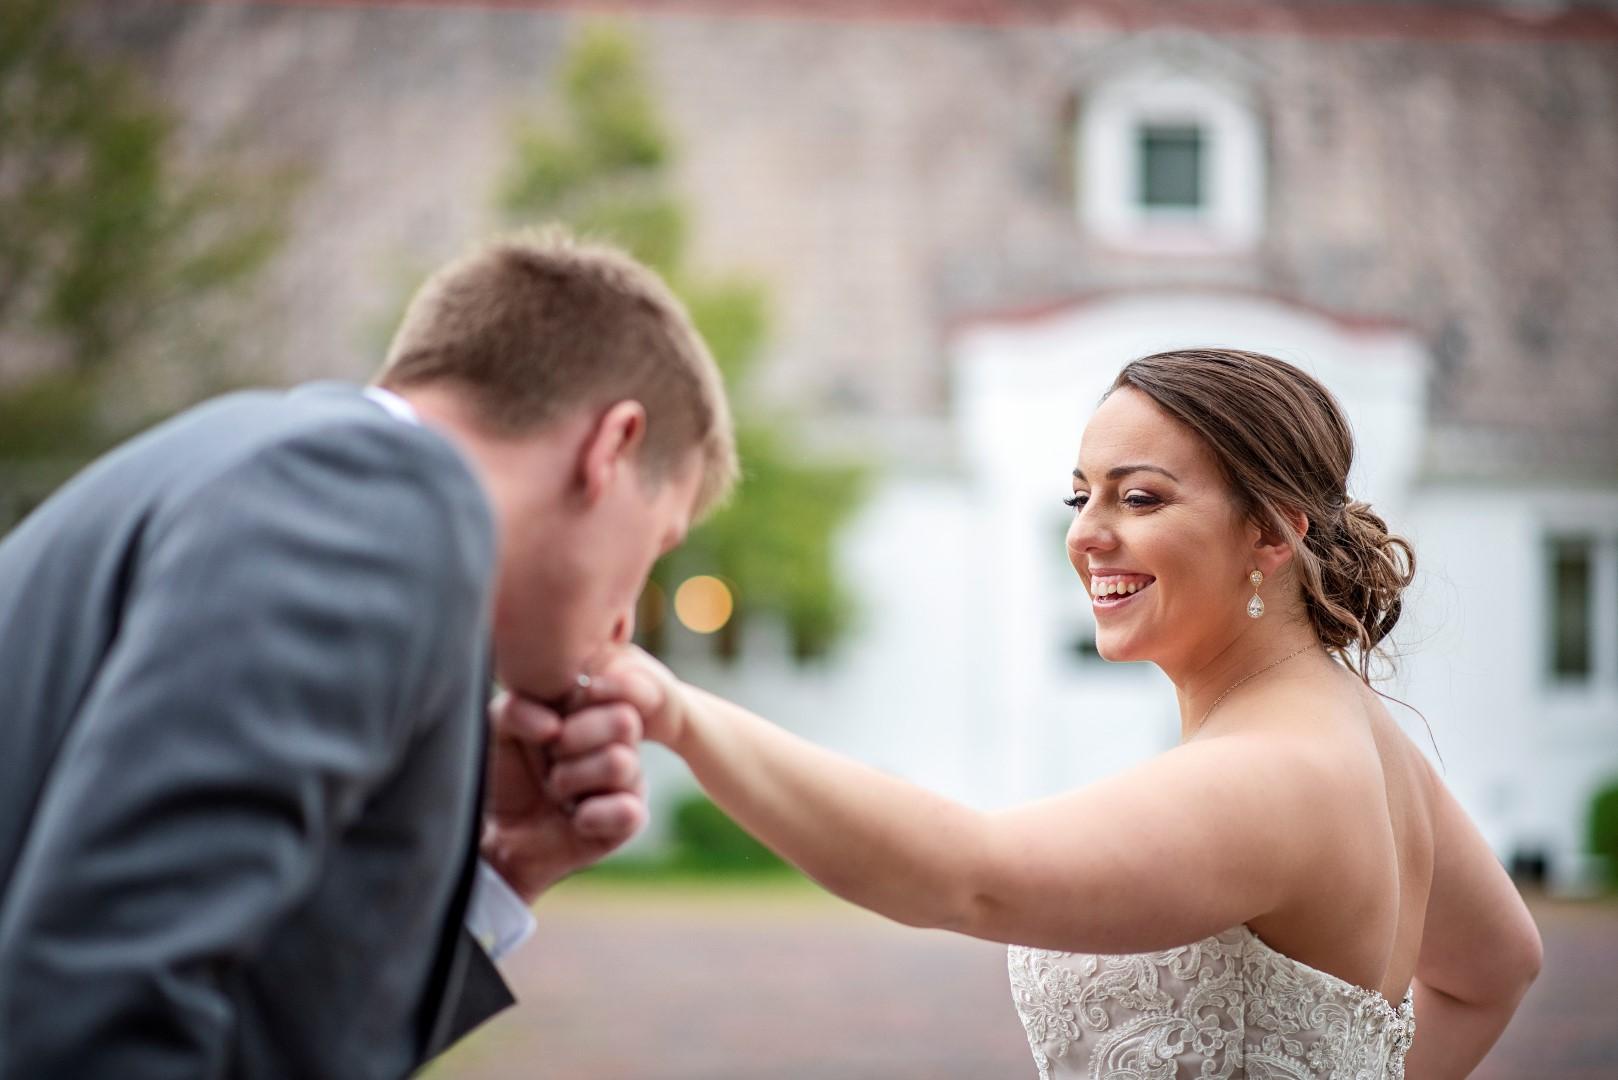 Courtney & Matt Dairy Barn Wedding May 2019_25 (Large).jpg